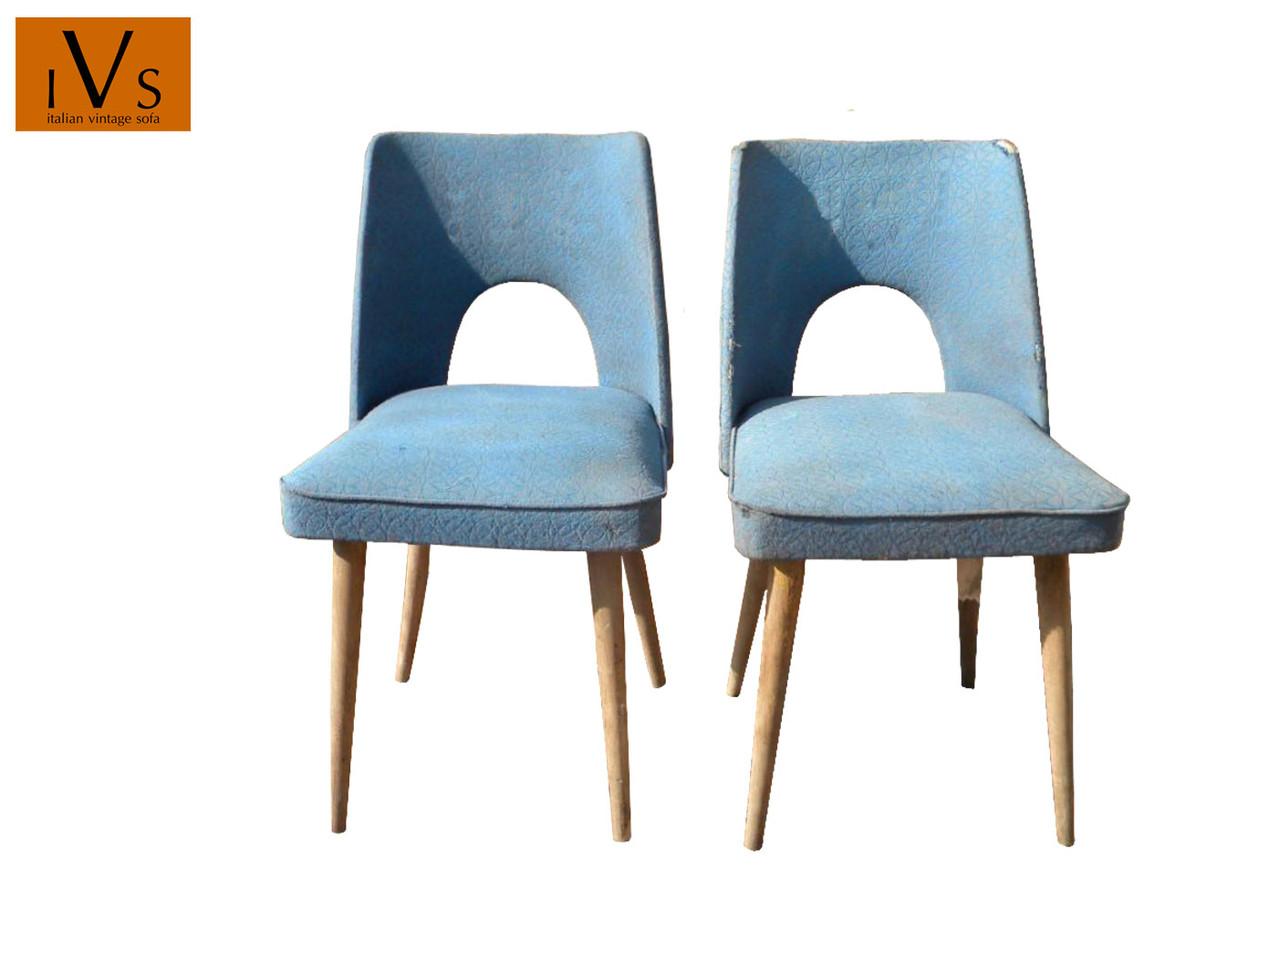 Sedie Club Chair Vintage Anni 50 Italian Vintage Sofa